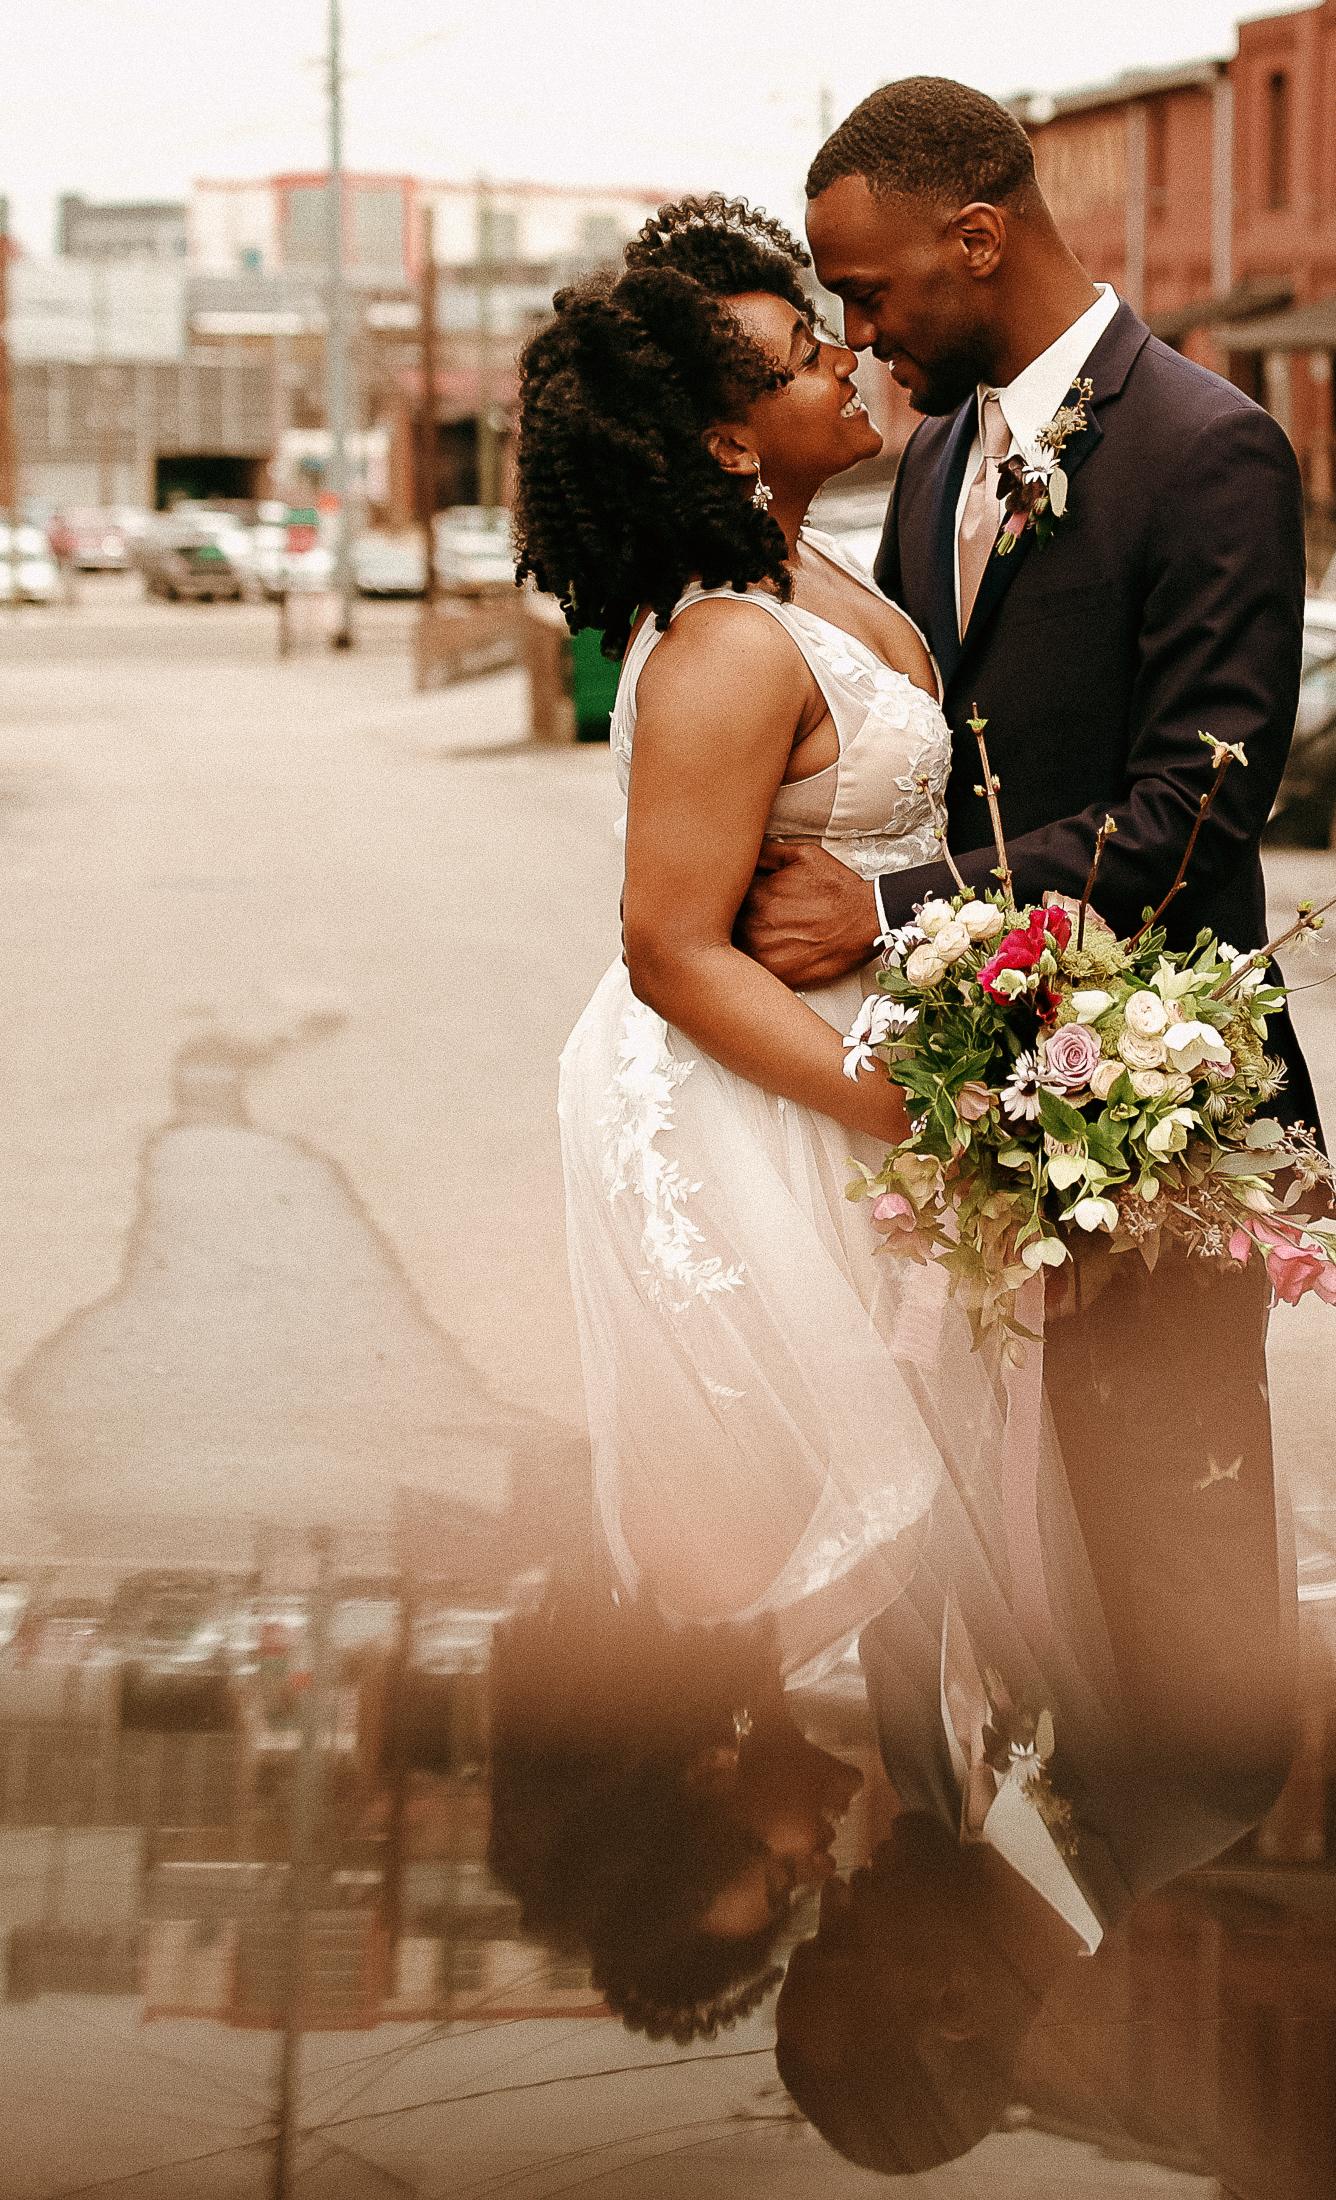 Big Fake Wedding Nashville   Ashlea Marie Photography and Videography